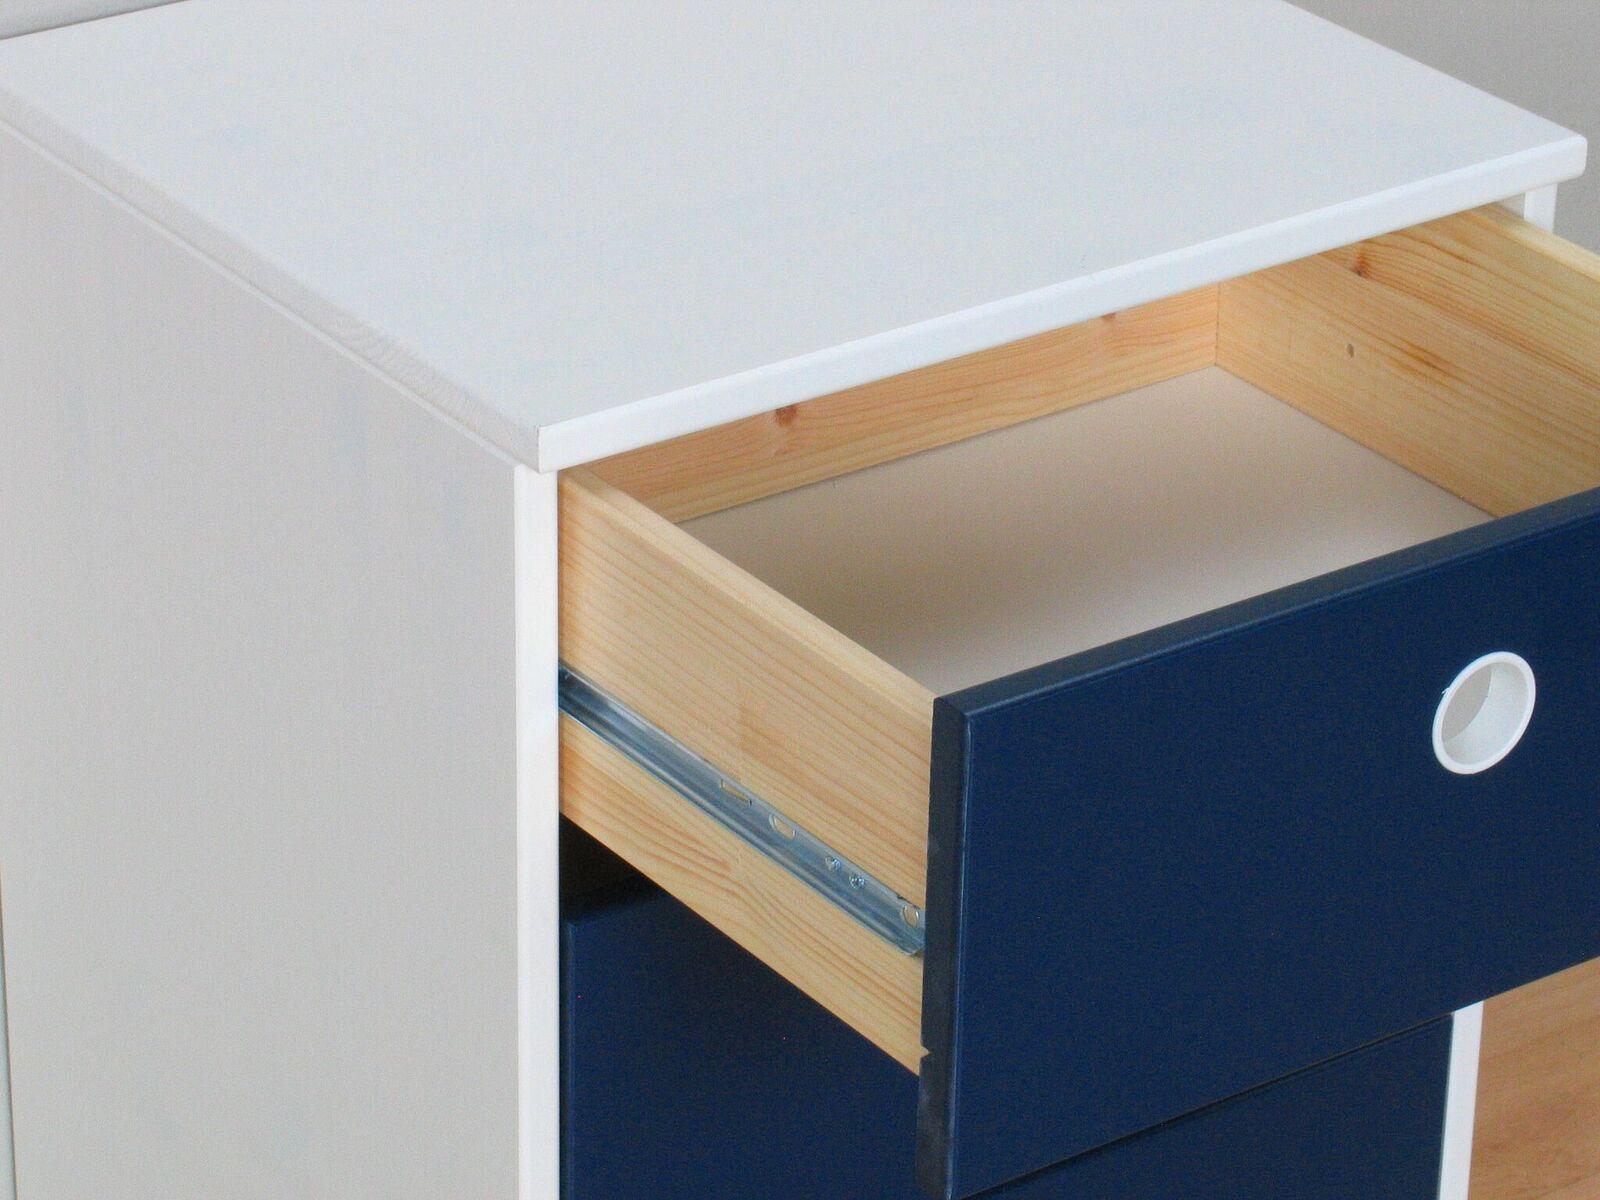 flexa schubladen kommode heine kiefer kinderzimmer schrank. Black Bedroom Furniture Sets. Home Design Ideas